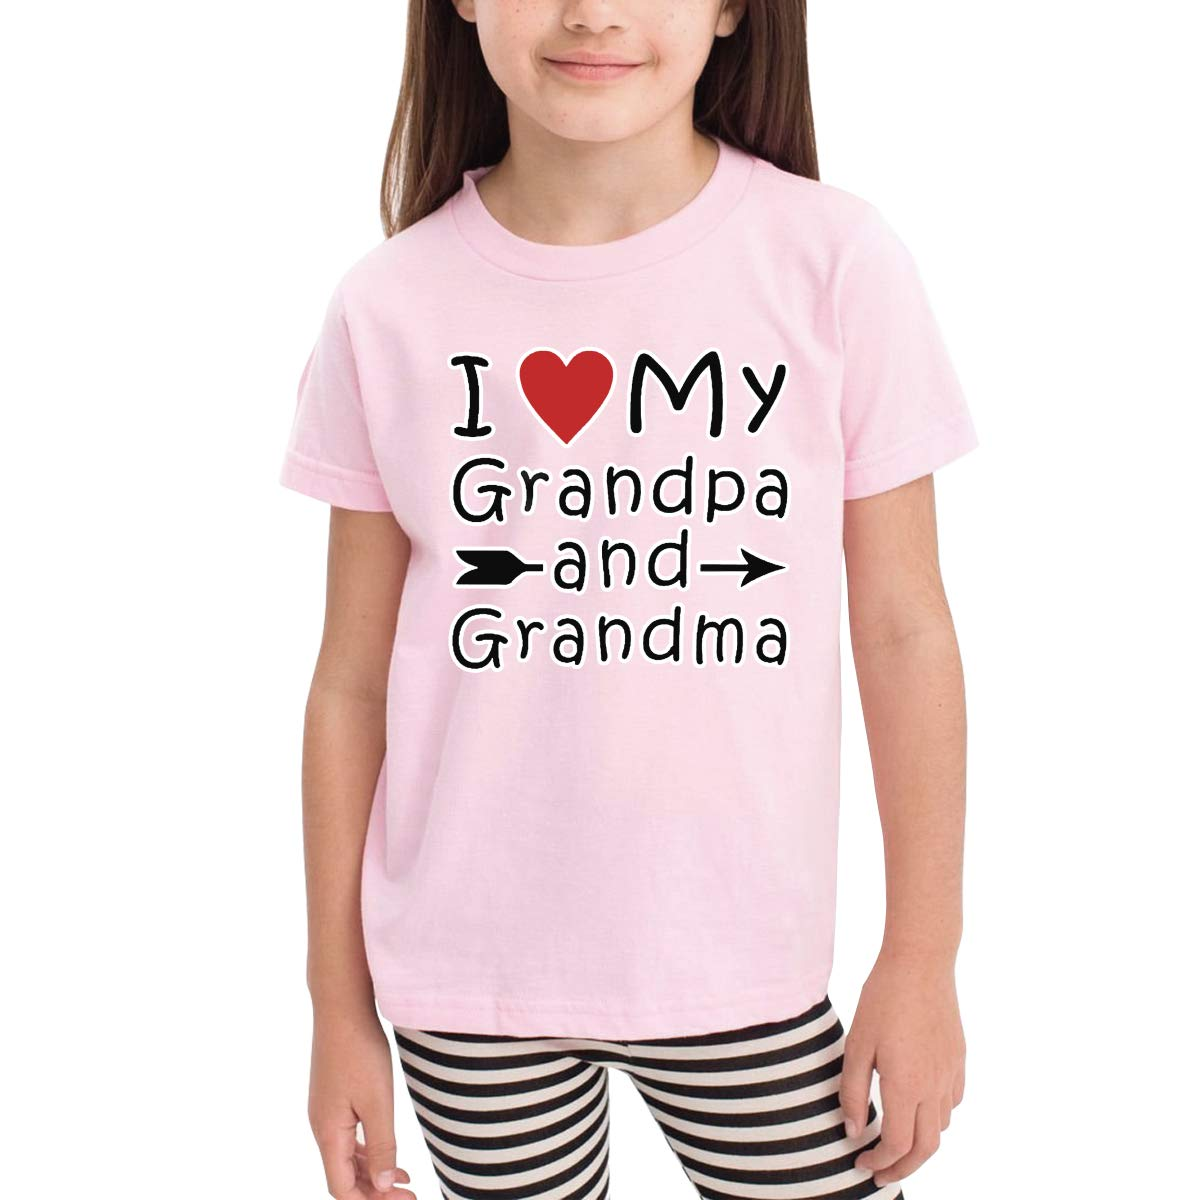 I Love My Grandpa and Grandma Unisex Youths Short Sleeve T-Shirt Kids T-Shirt Tops Black